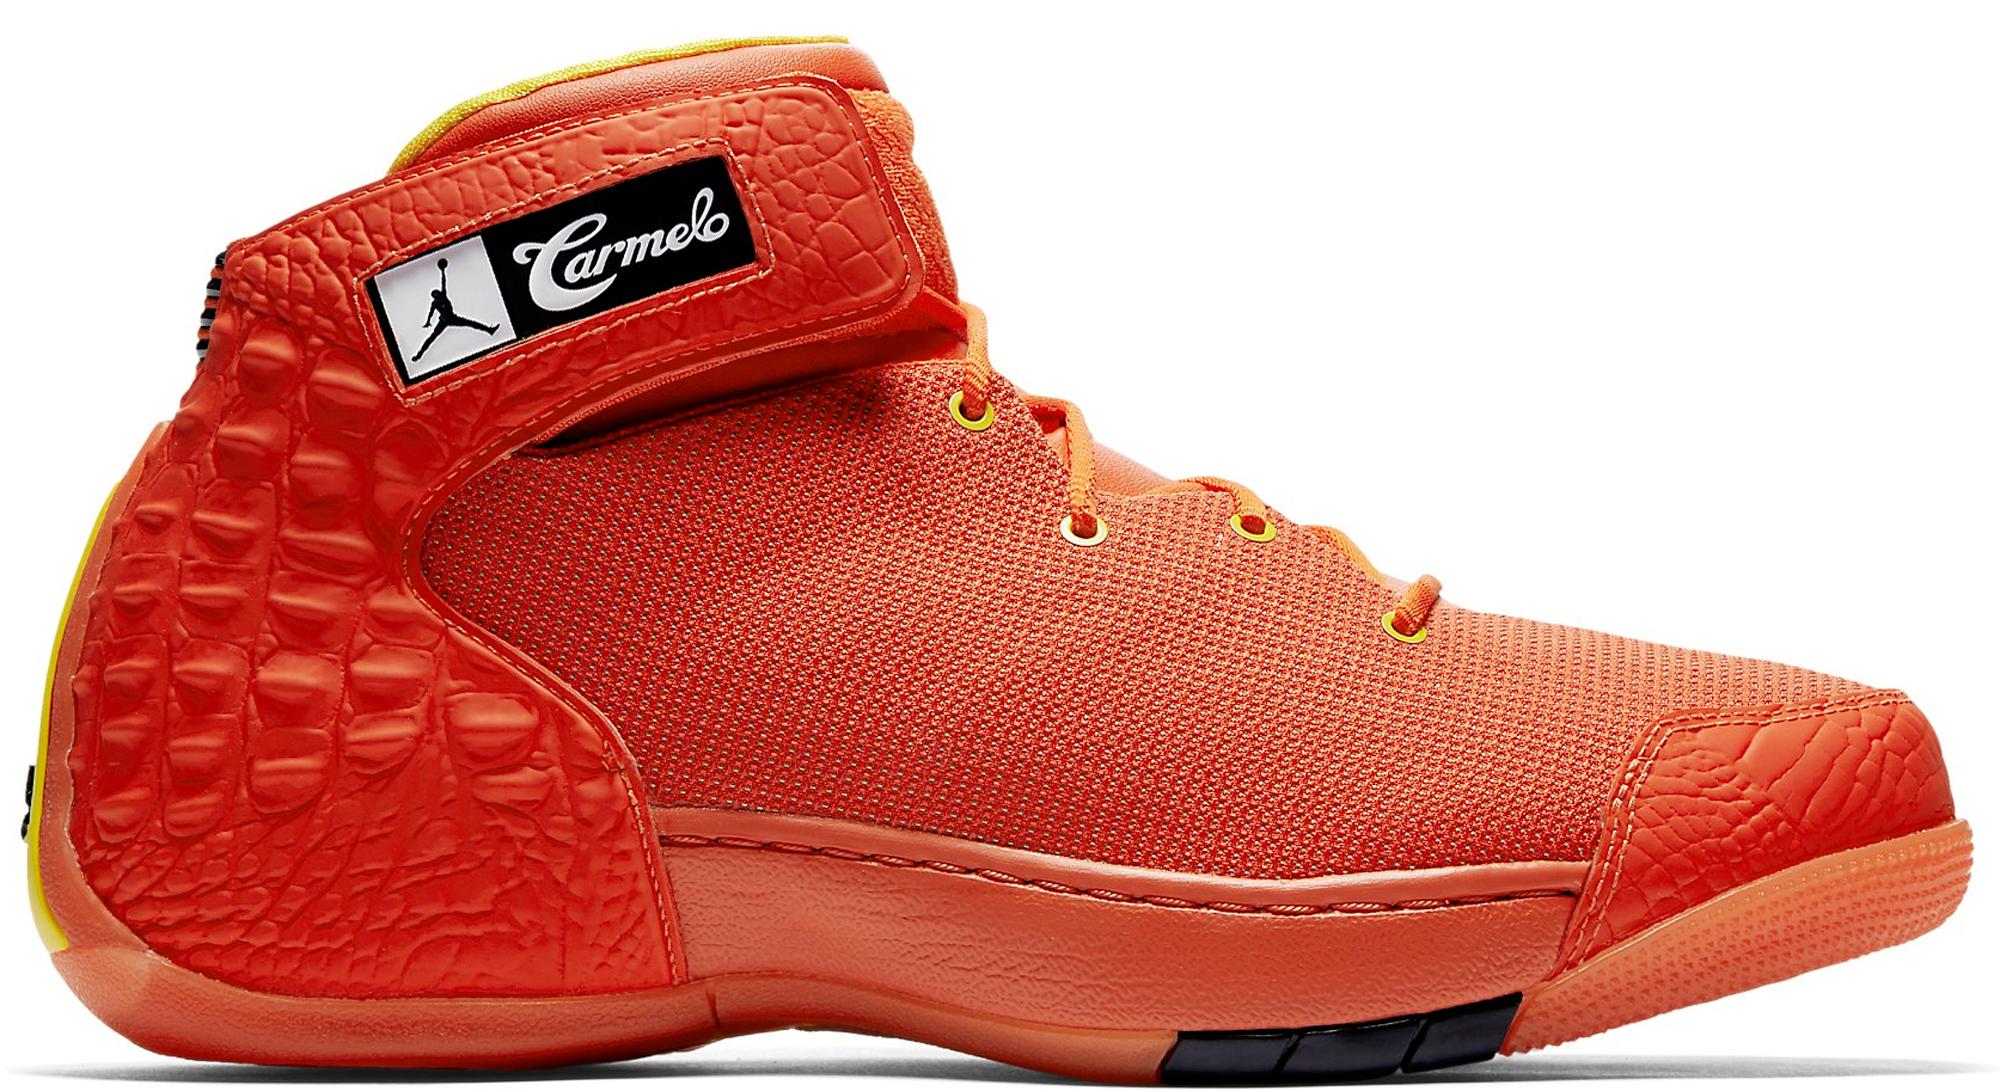 Jordan Melo 1.5 OKC PE - Sneakers